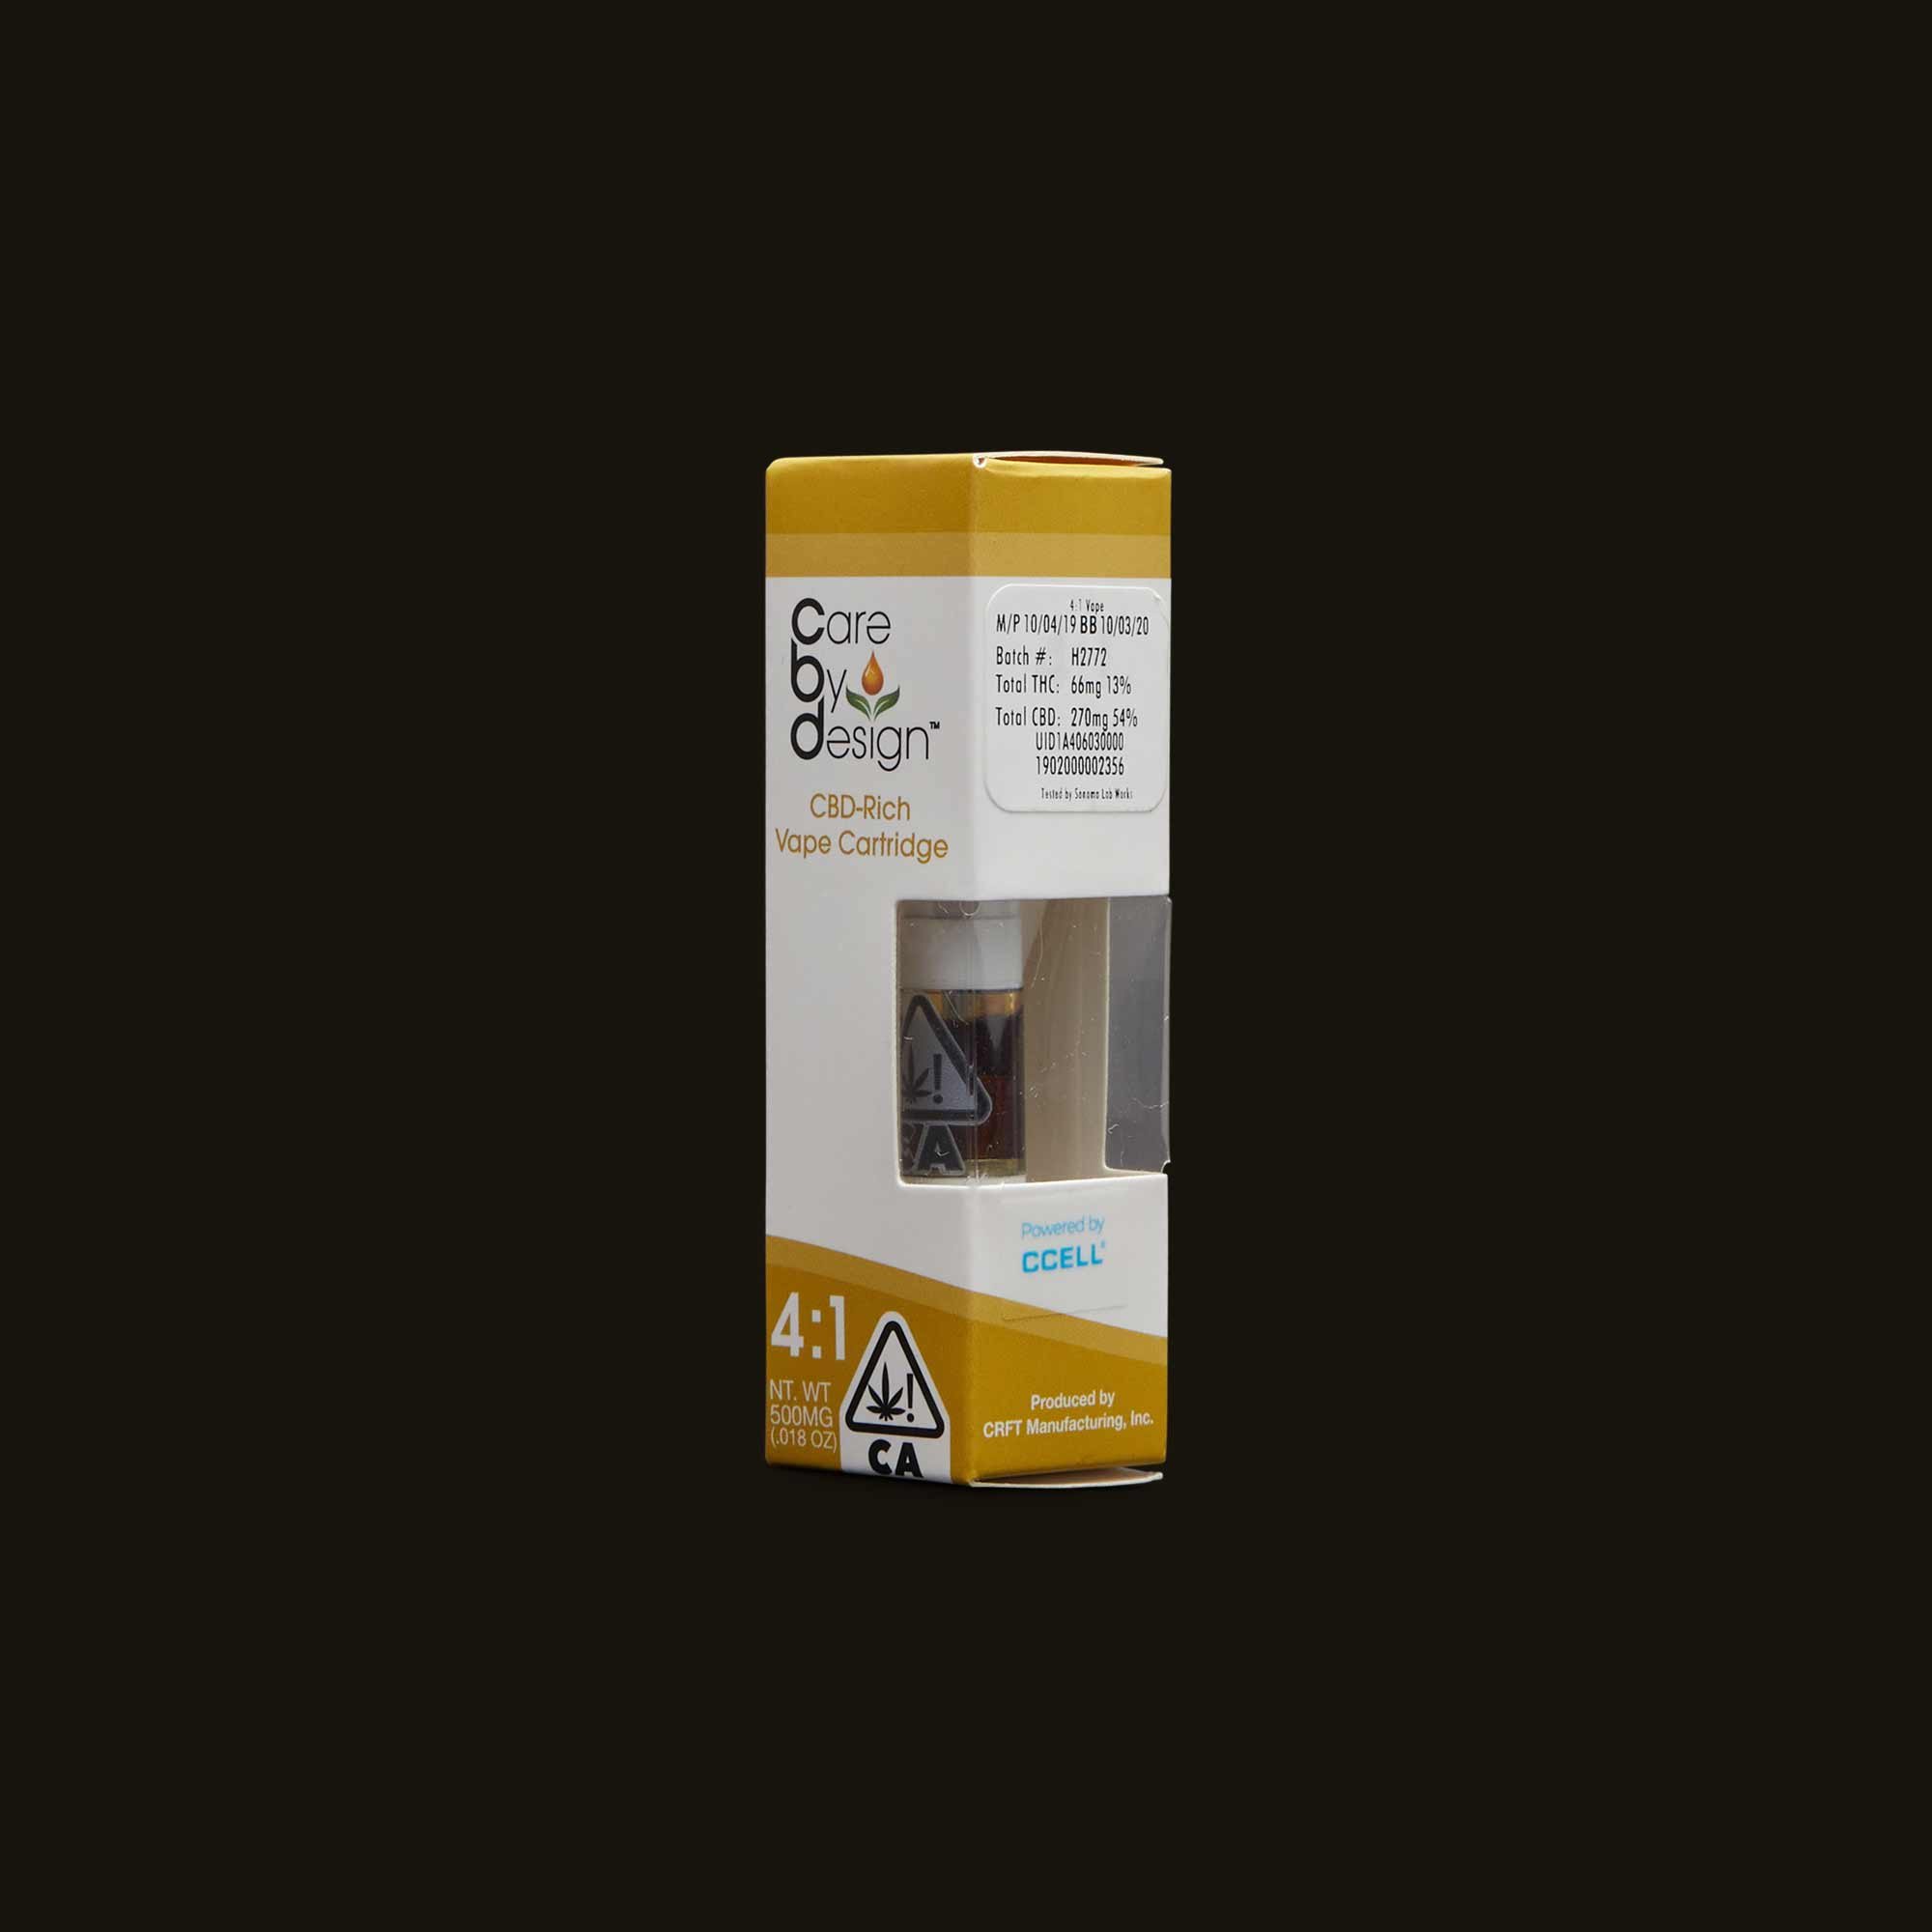 Care By Design Vape Pen - 4:1 Vape Cartridge